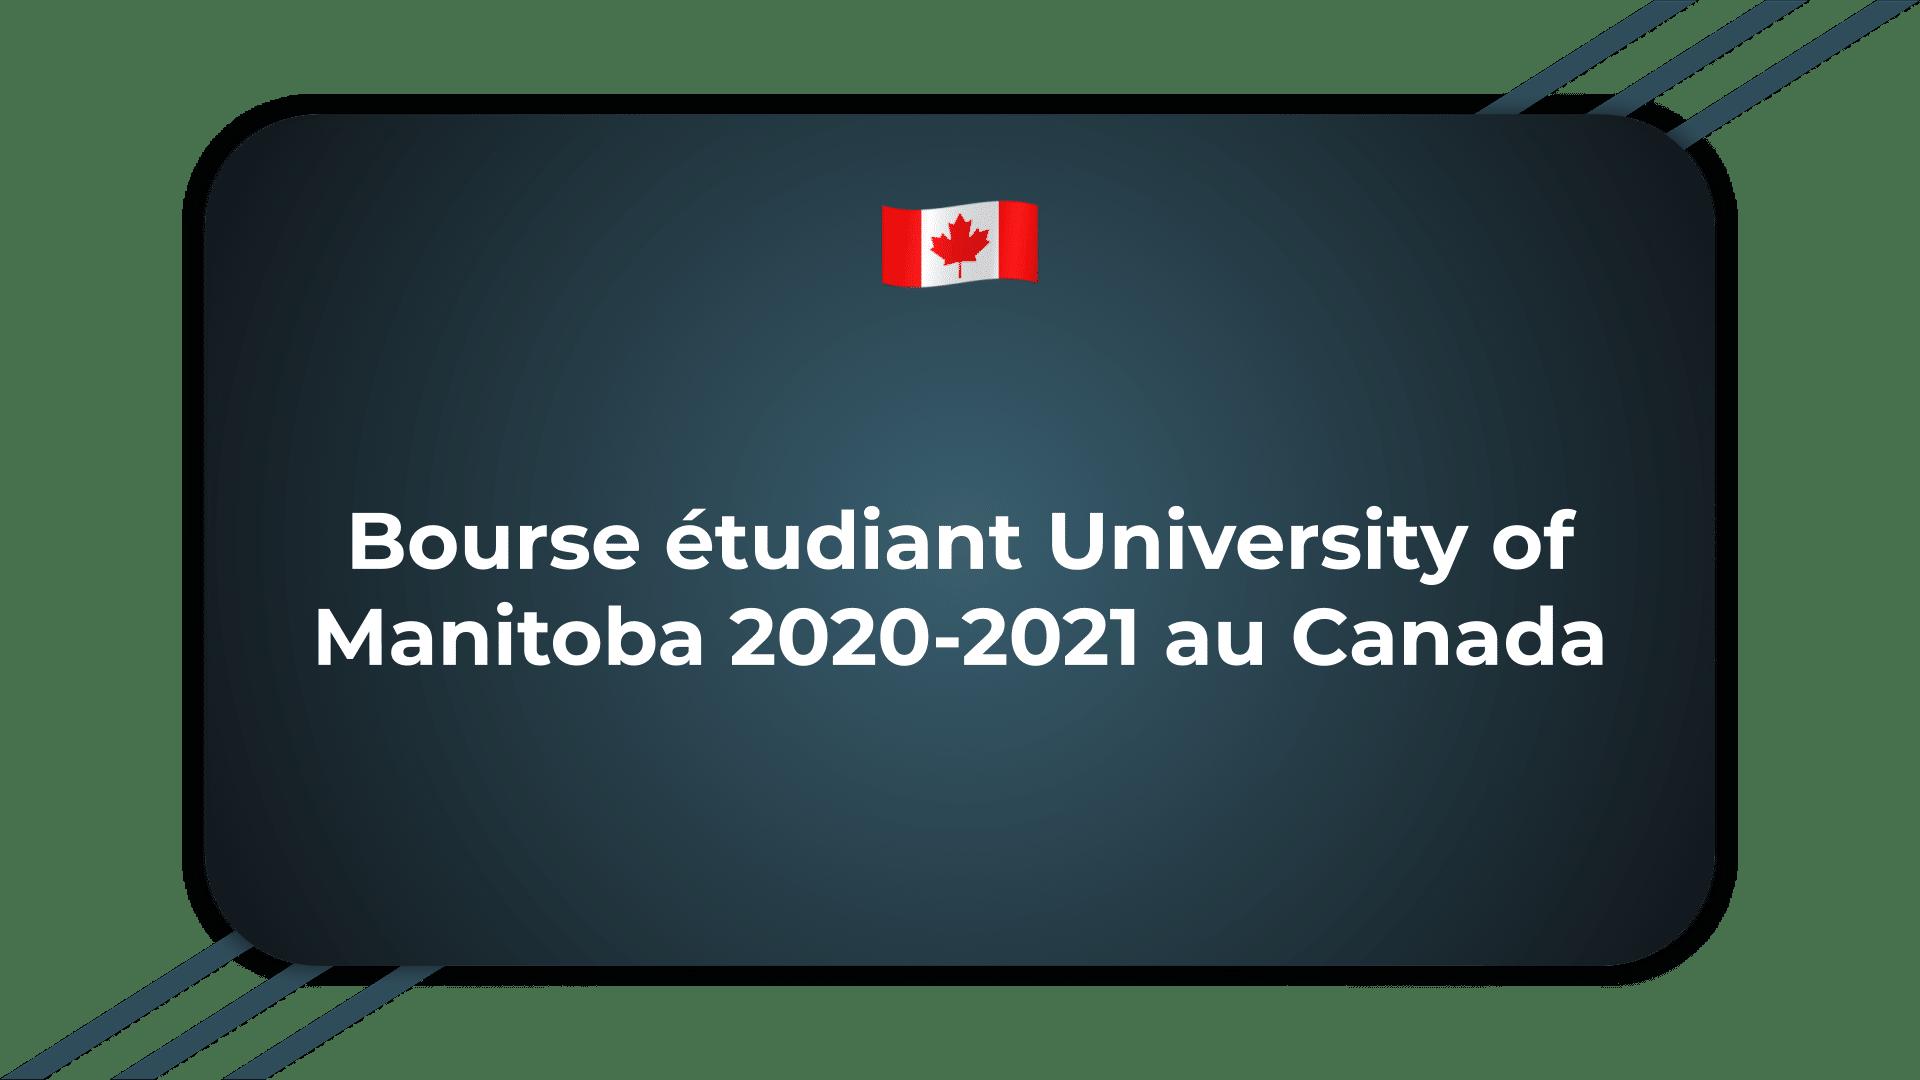 Bourse étudiant University of Manitoba